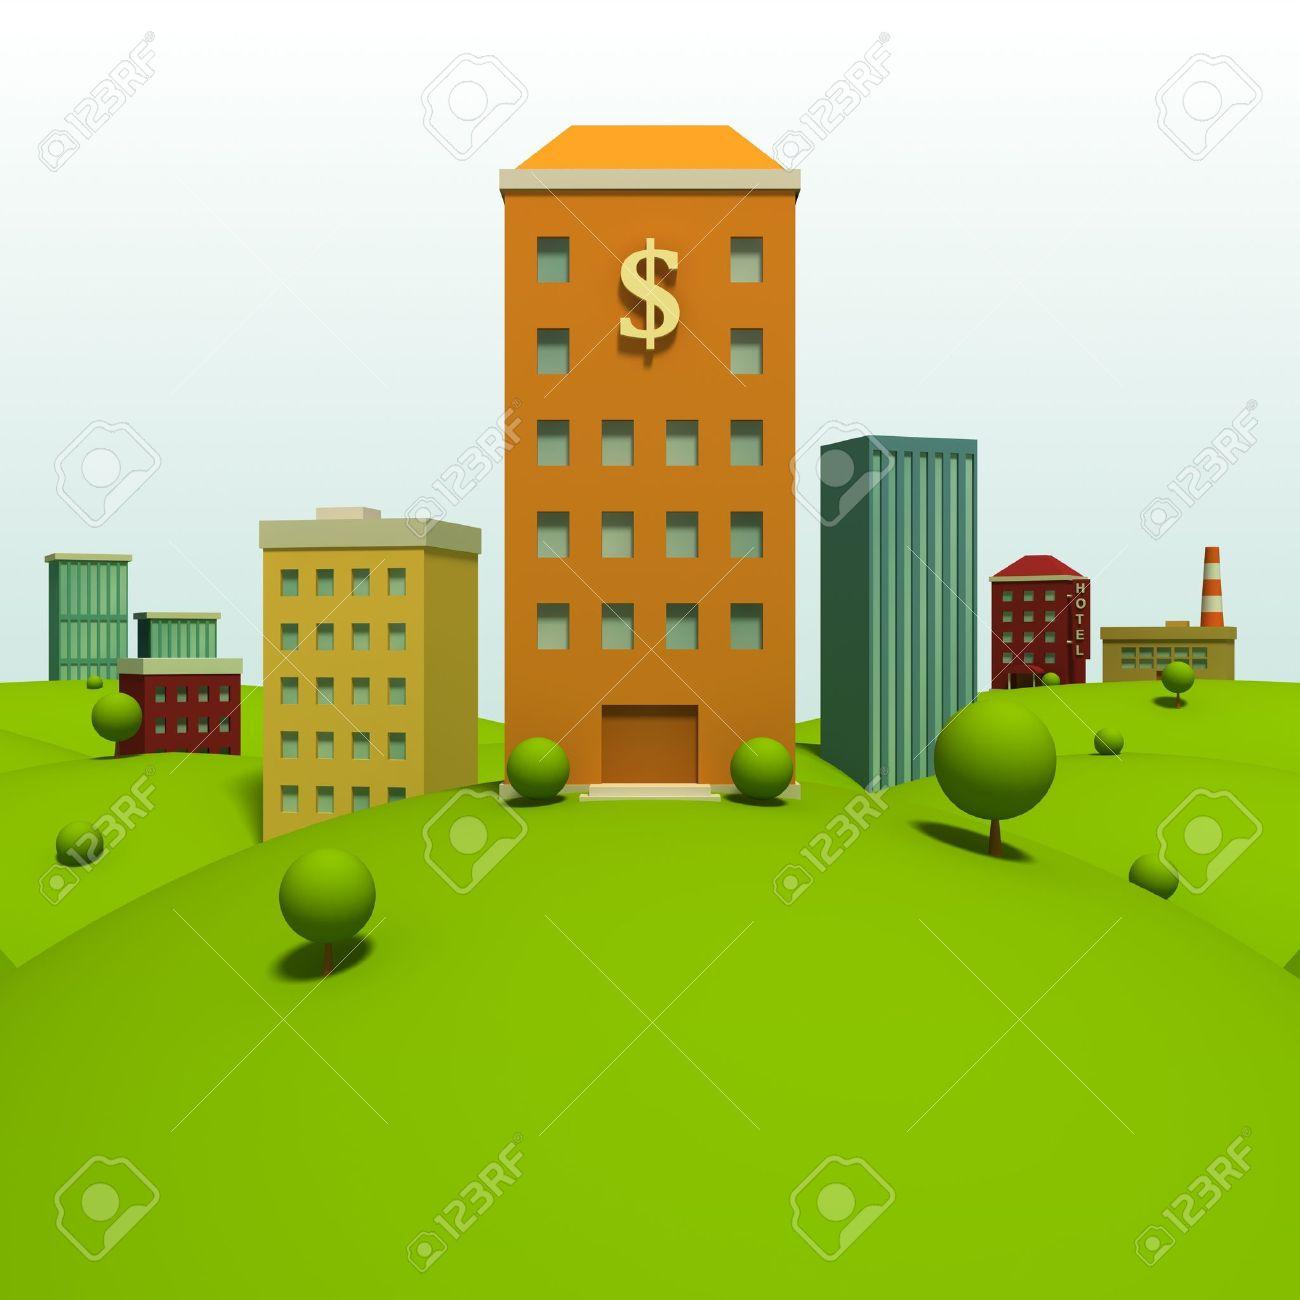 Bancos Dibujos Animados Dibujos Animados Con Banco